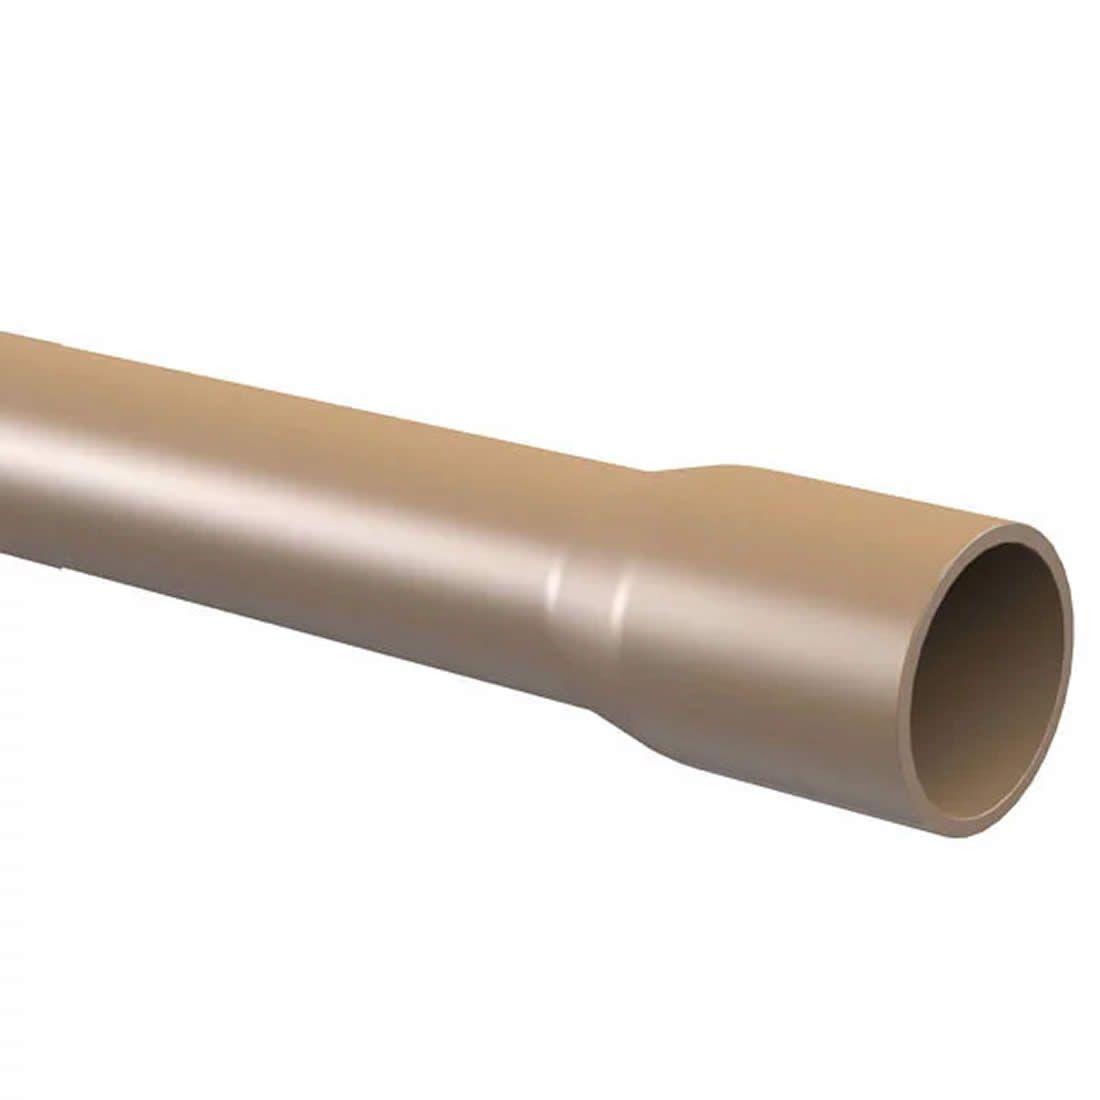 Tubo PVC Soldável 50mm X 6 Metros Tigre